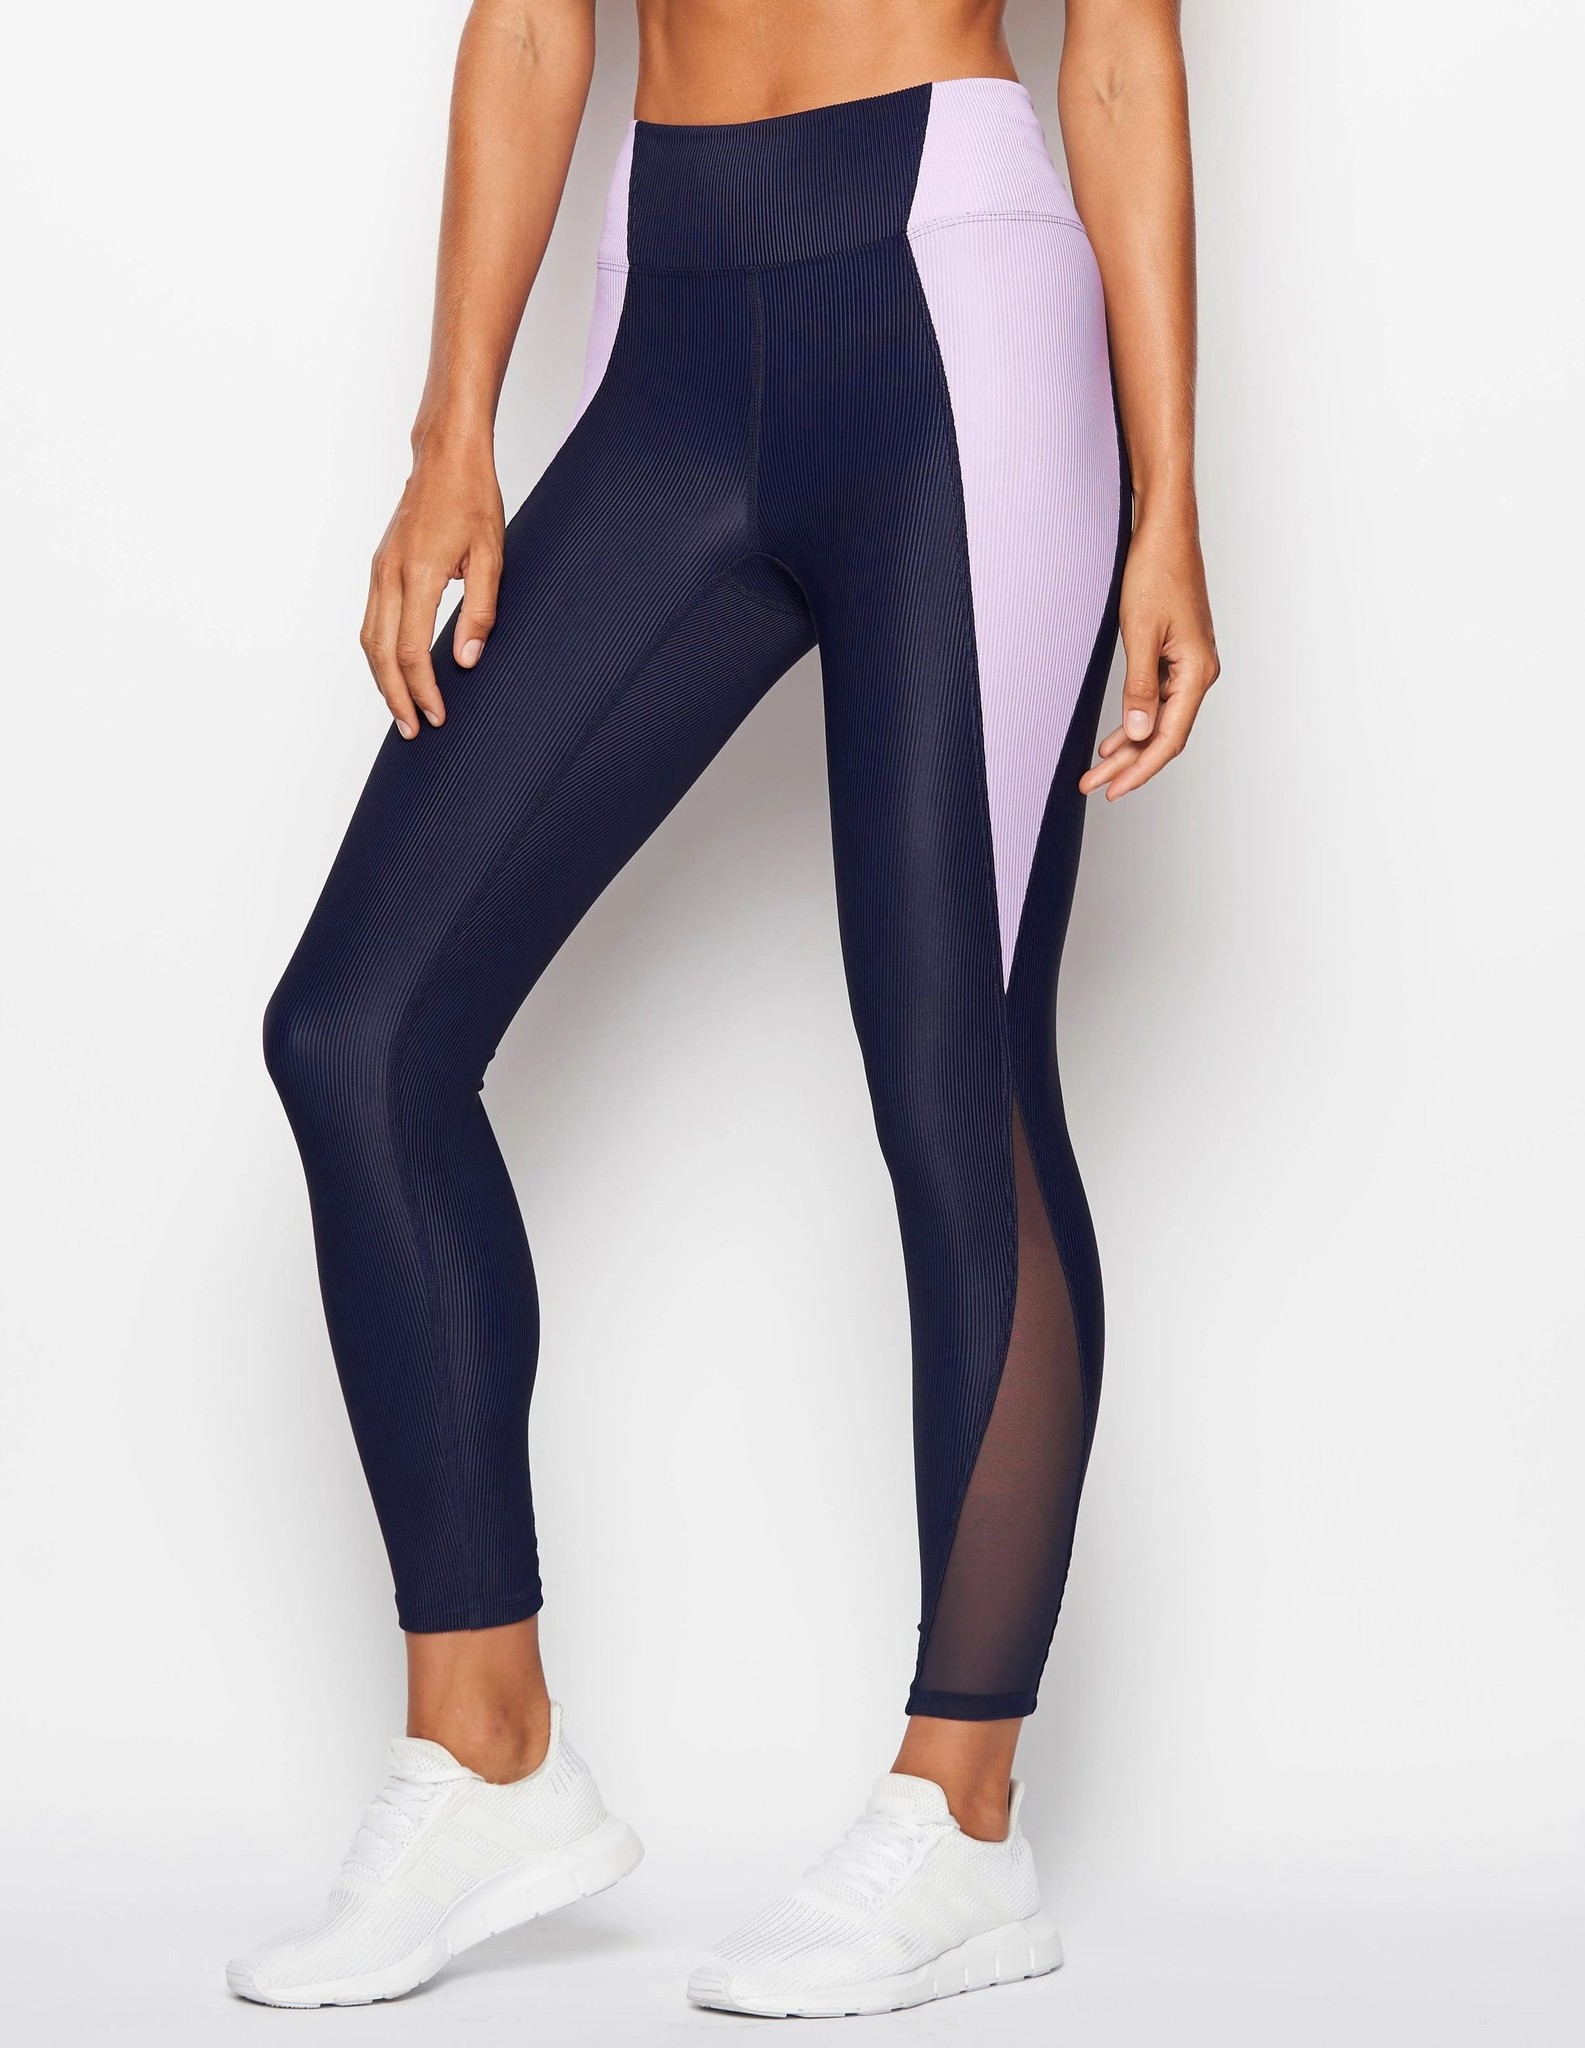 Heroine Sport Gym Legging Navy/Lilac